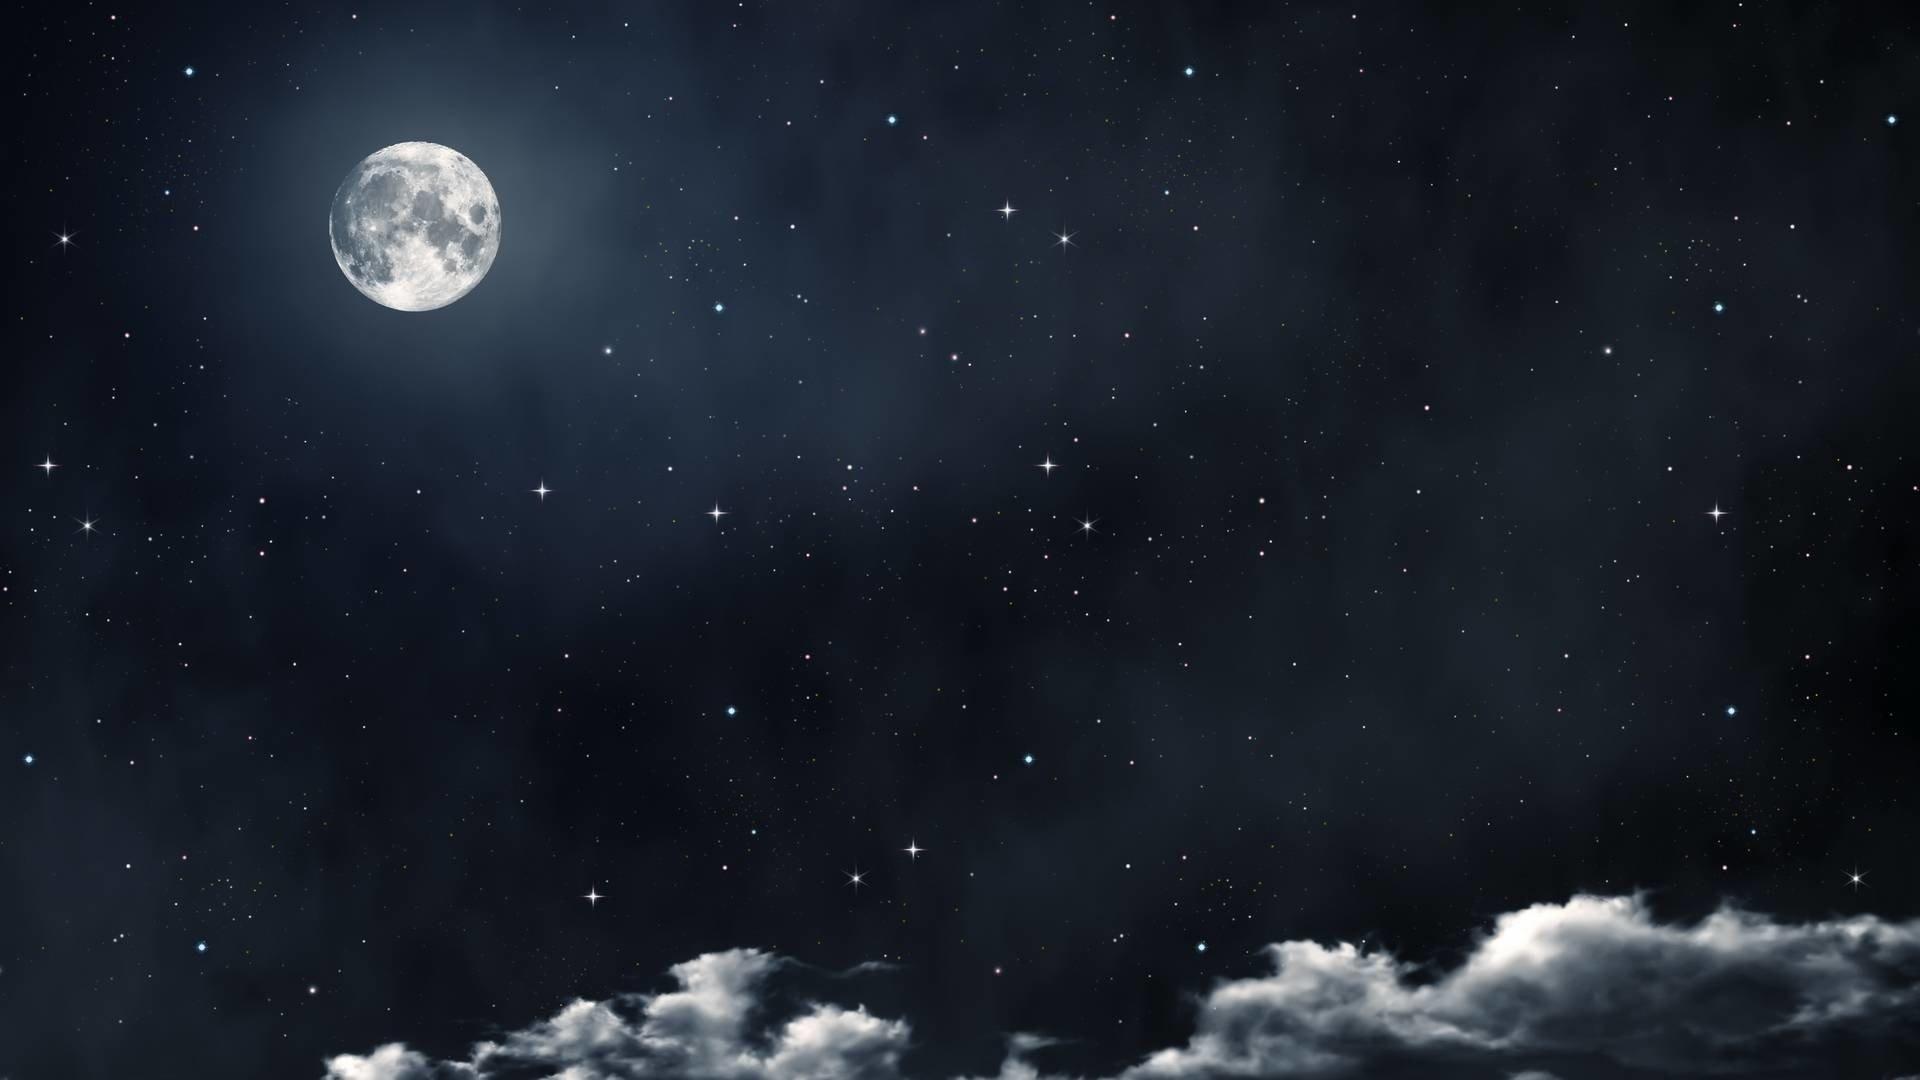 Aesthetic Moon Wallpaper HD